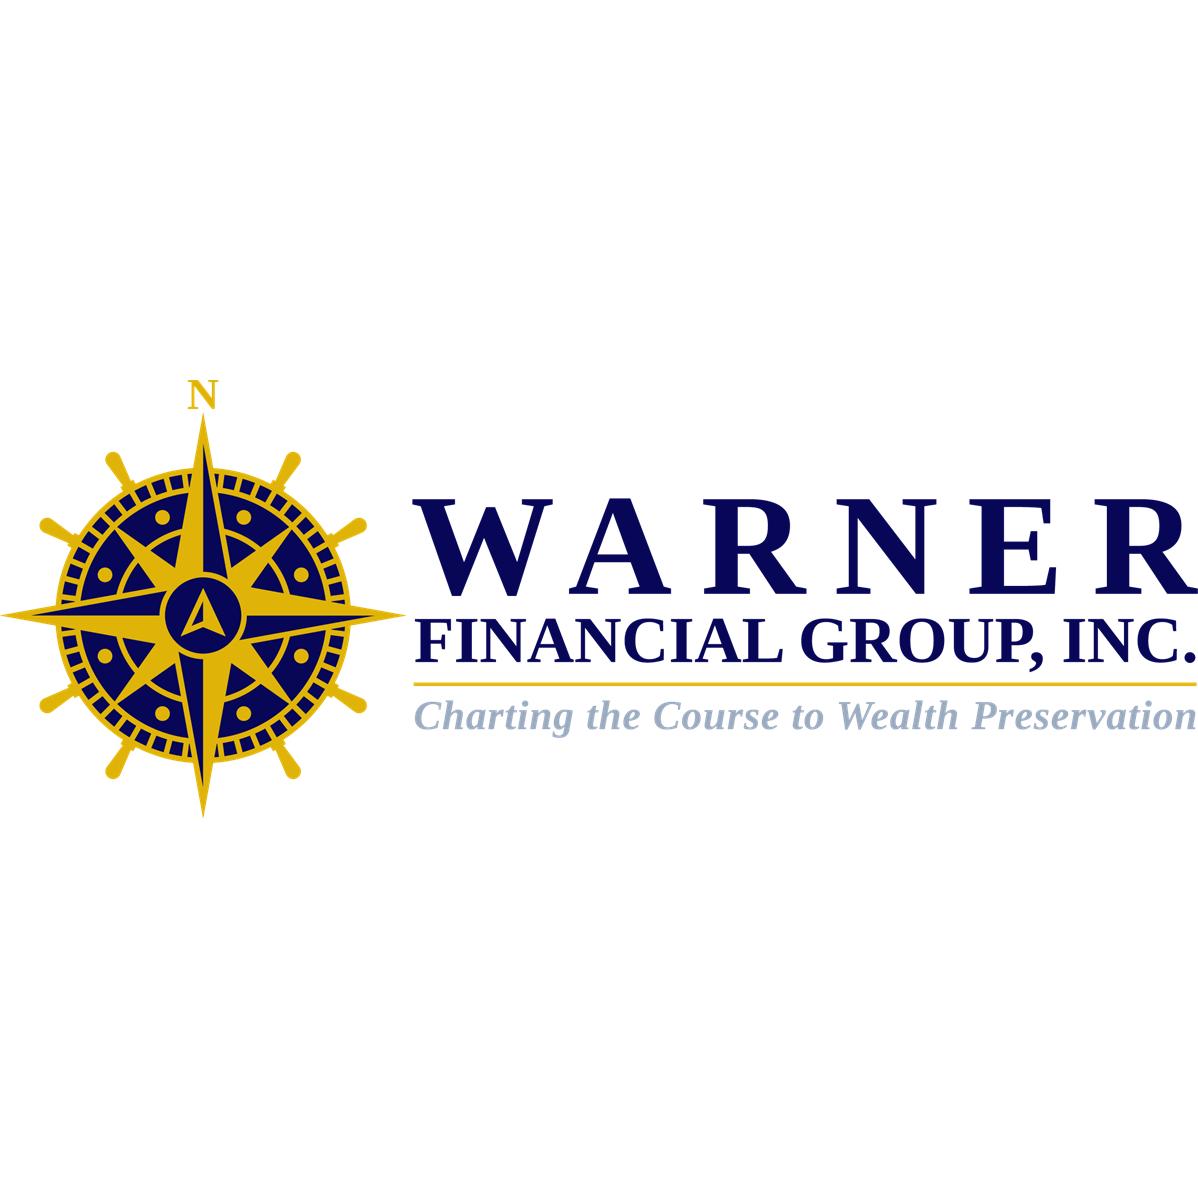 Warner Financial Group, Inc.